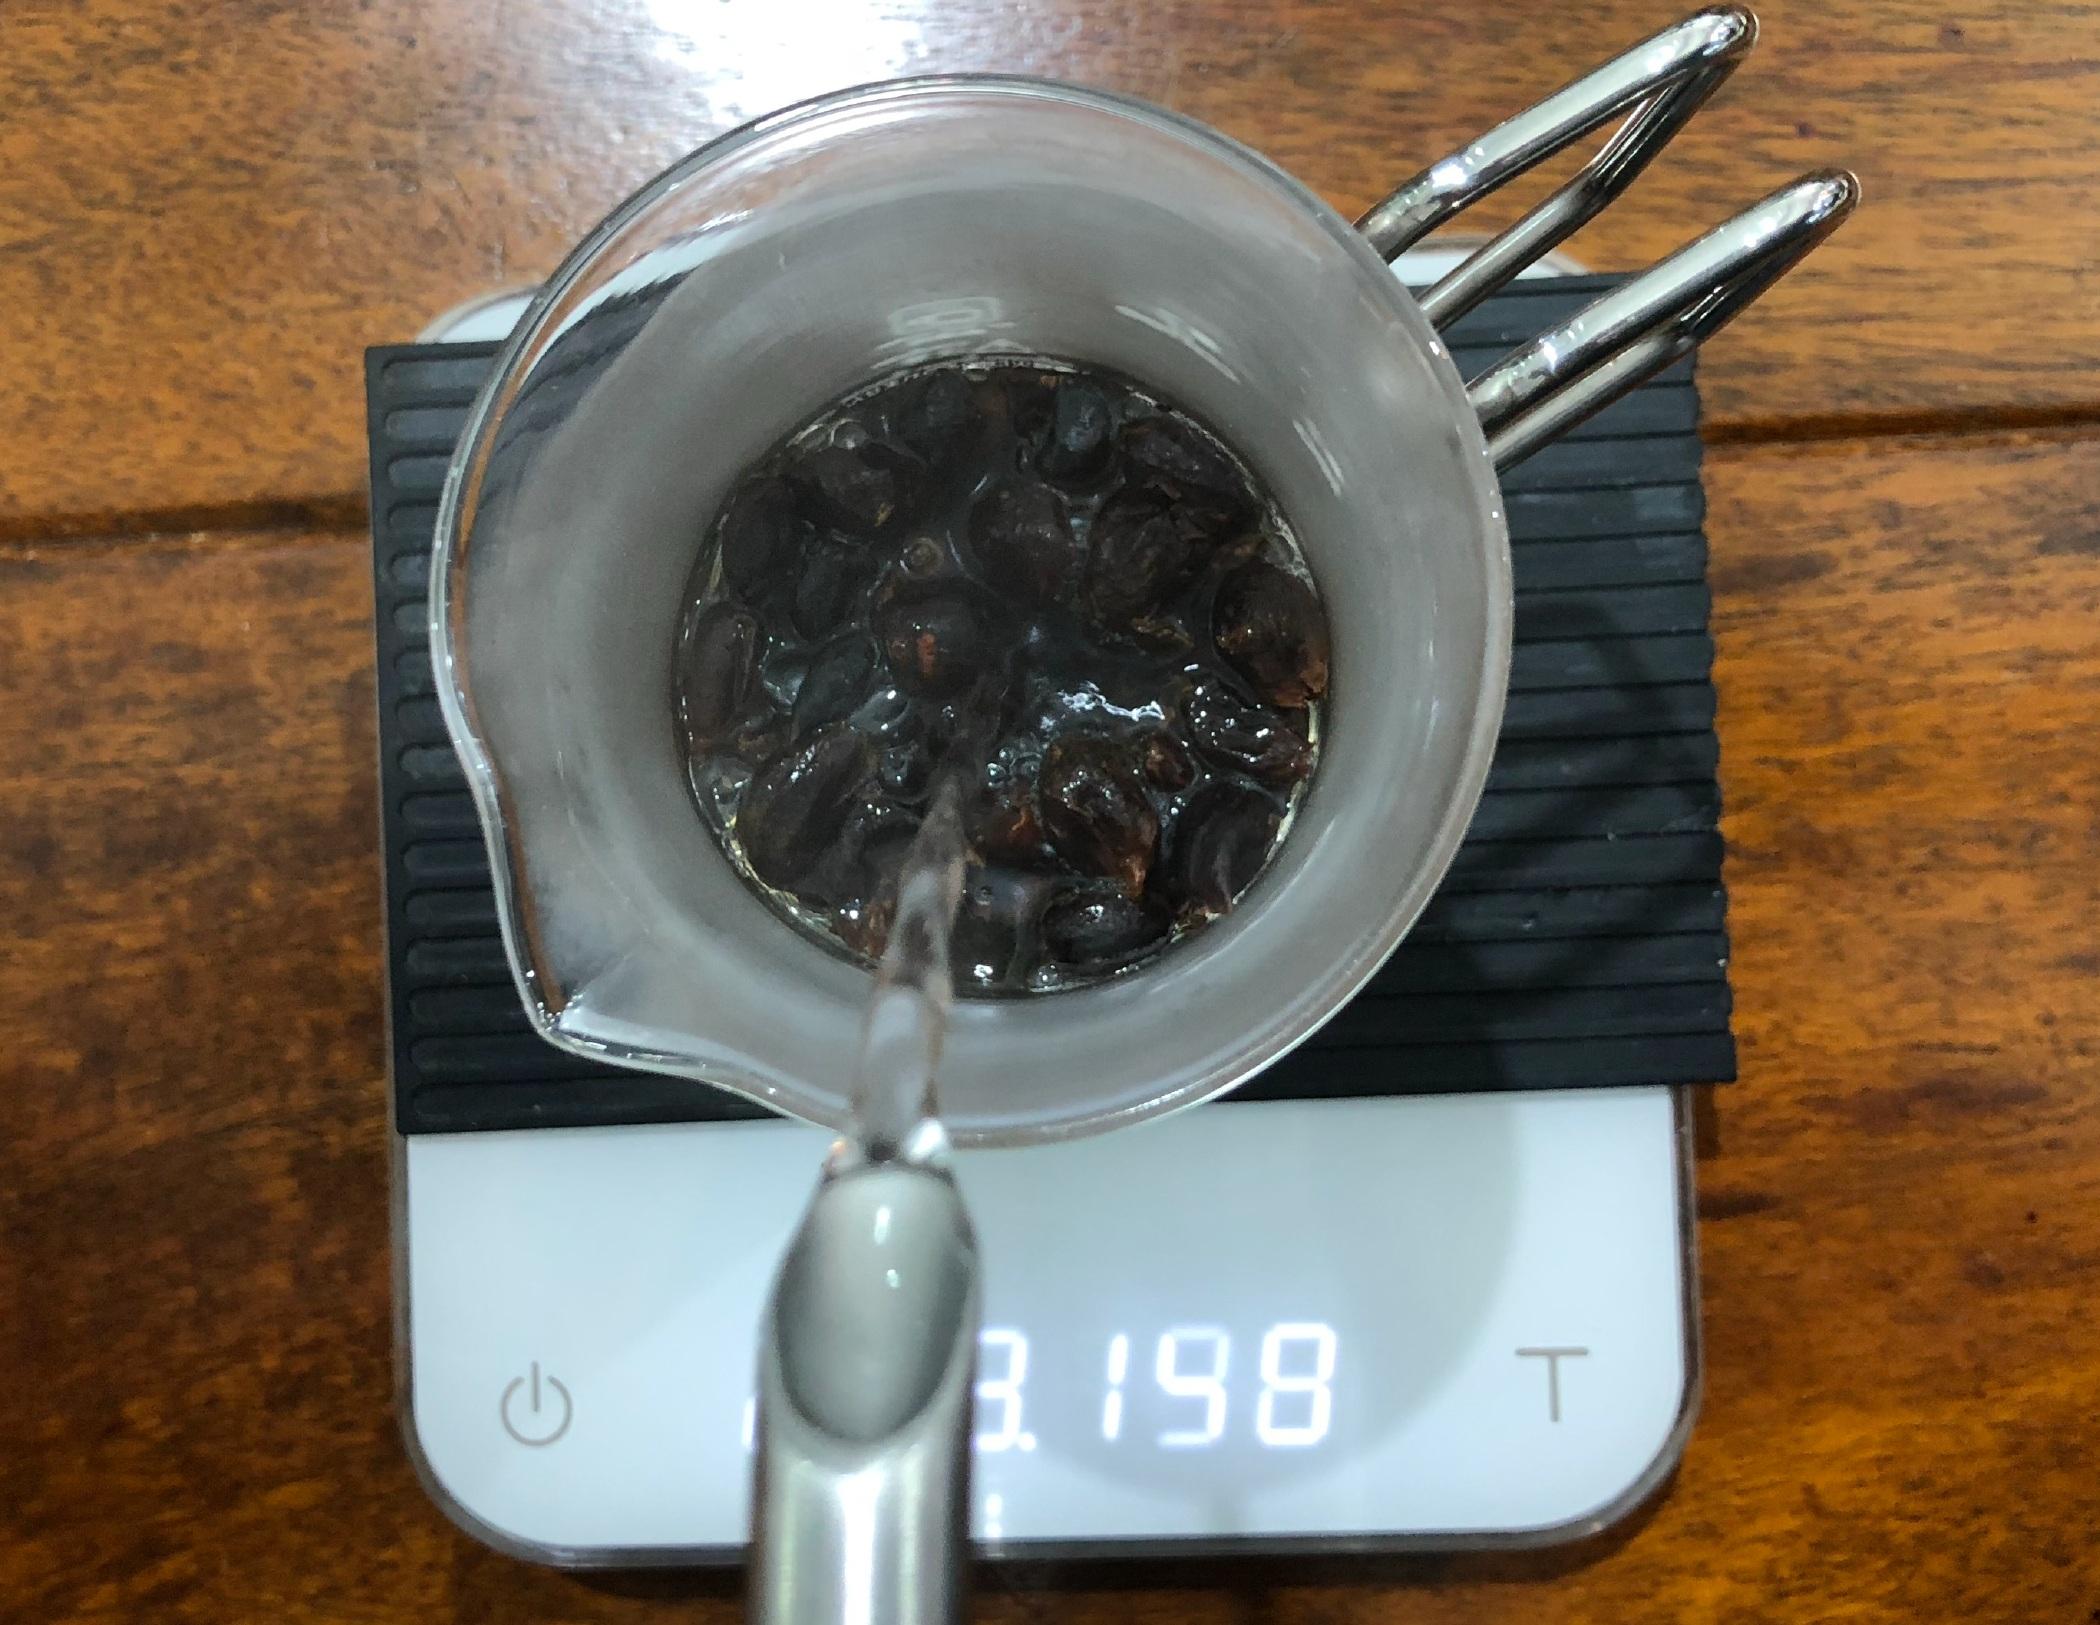 Paso #2 - - Agrega 234 gramos de agua caliente a una temperatura de 85° a 90° C. (Punto de ebullición).